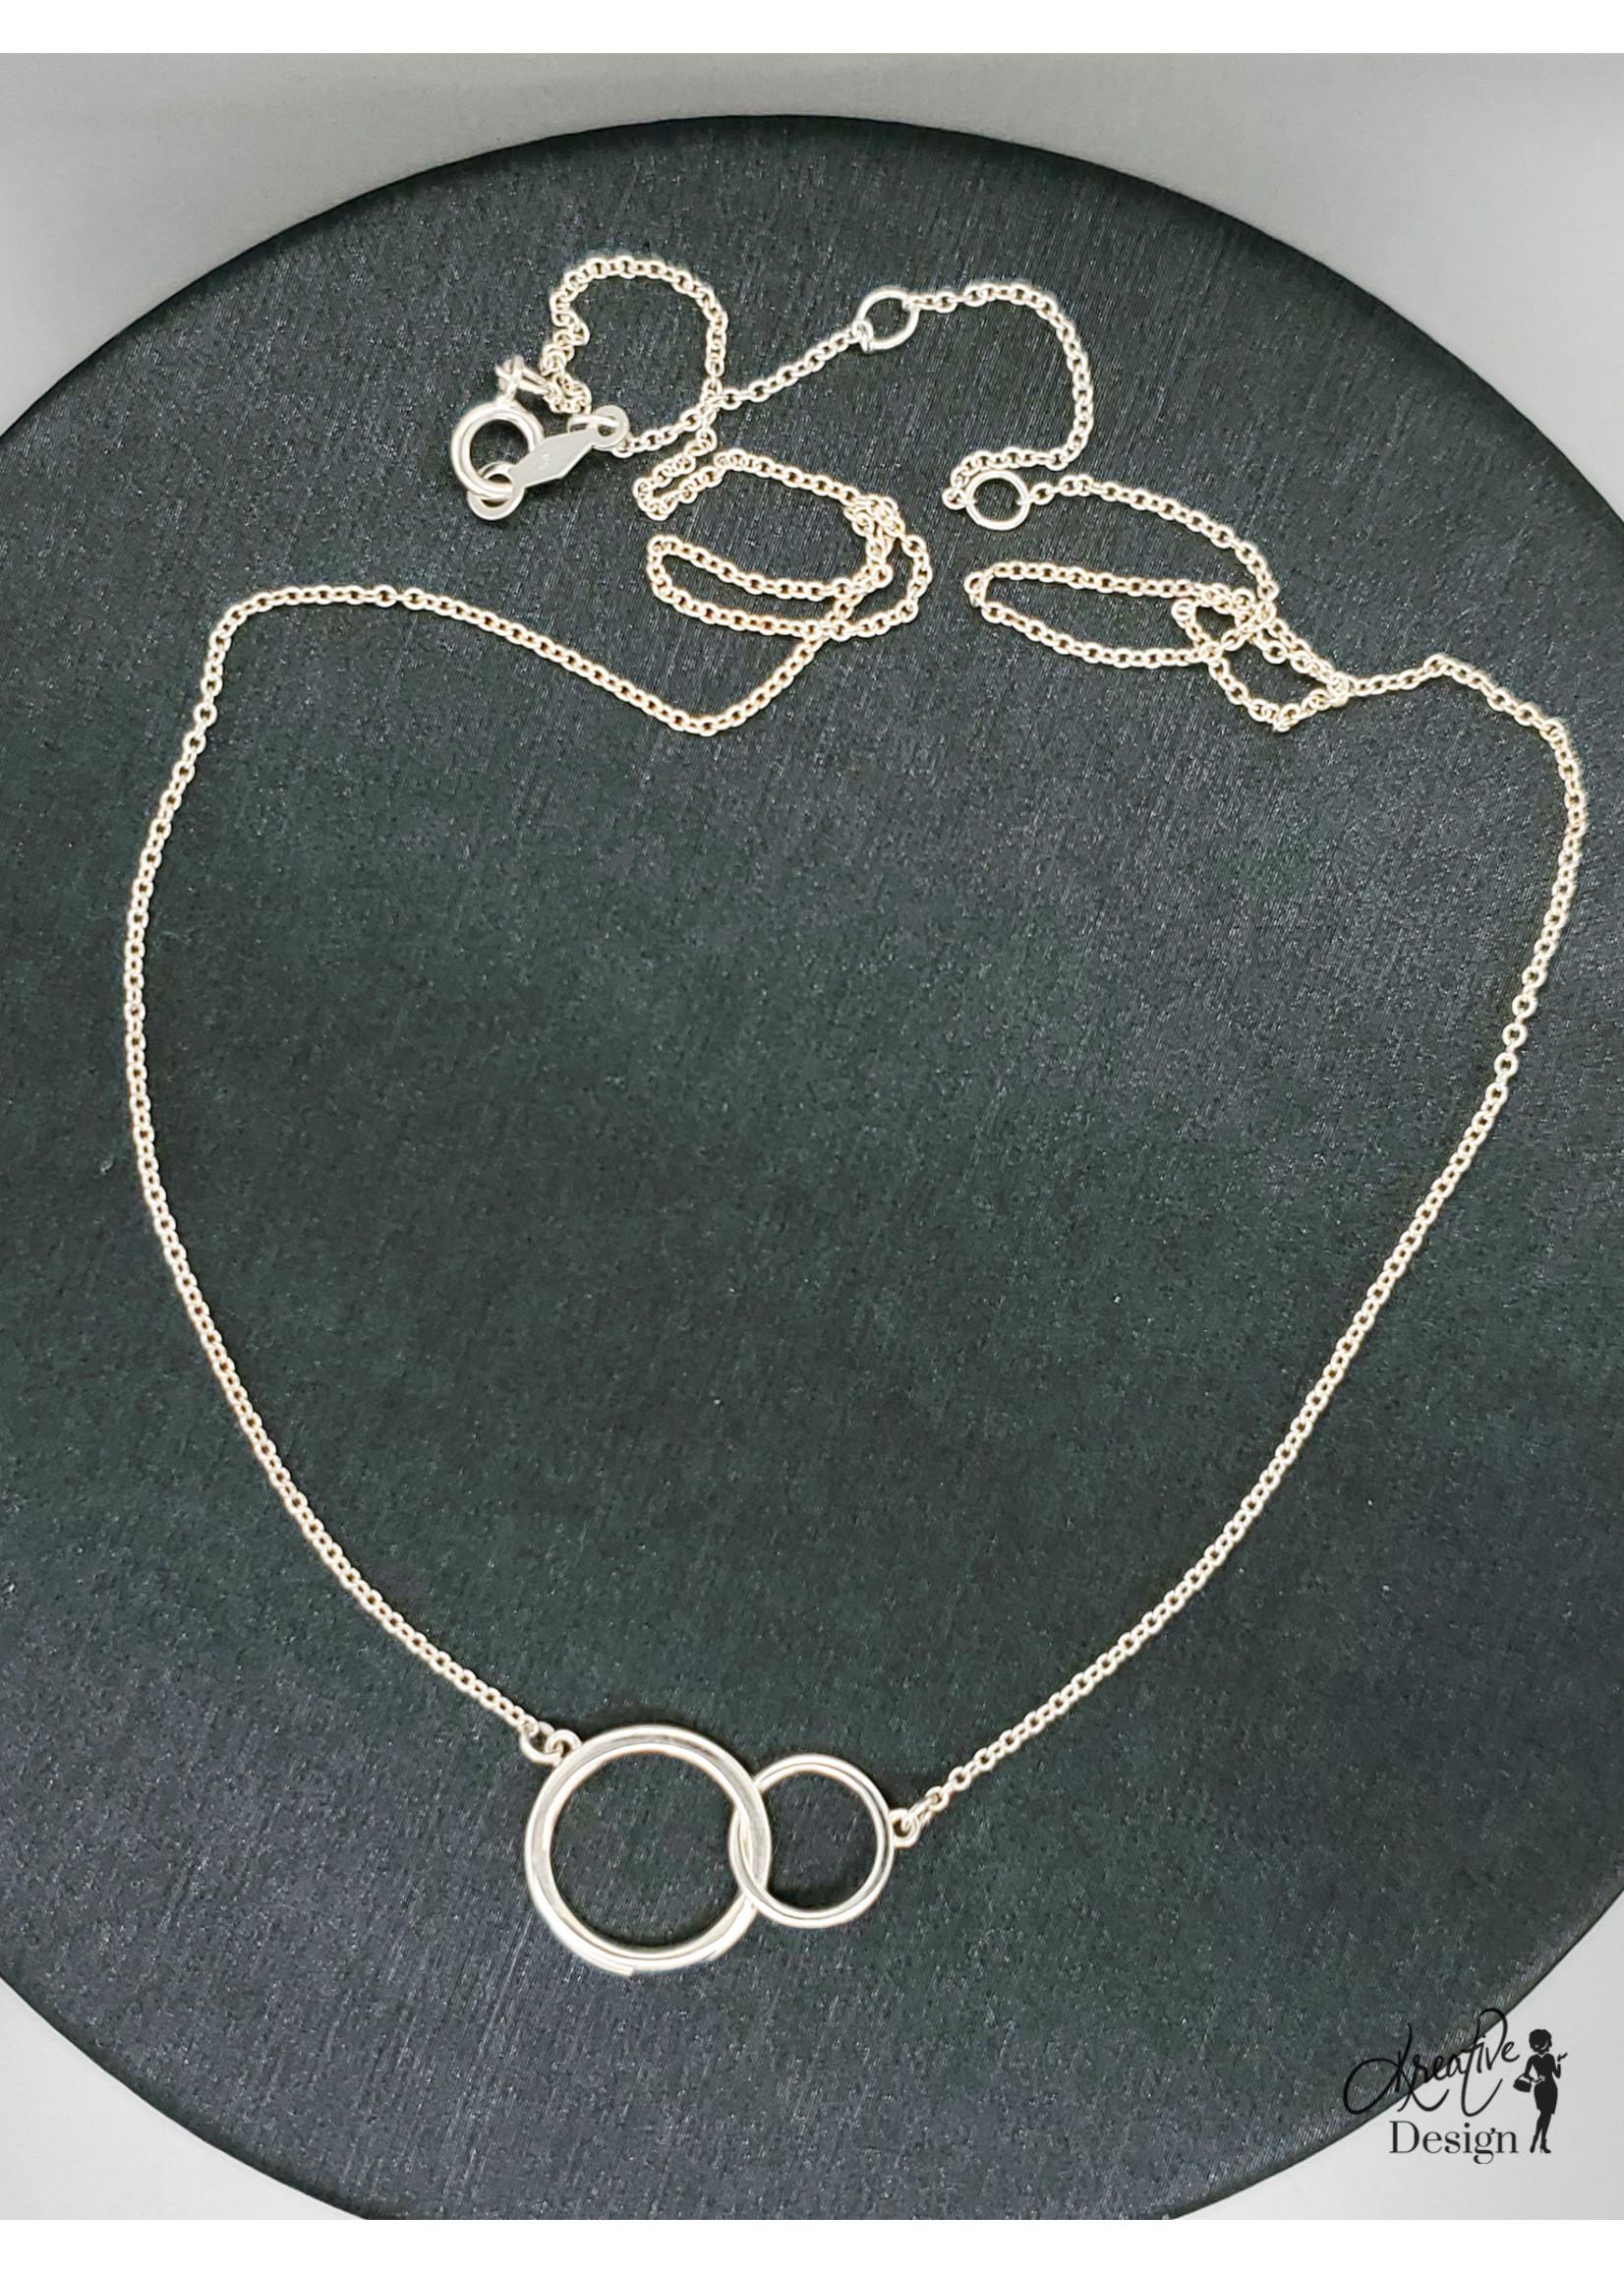 KDesign Regal Collection Regal Big-Little Circle Necklace